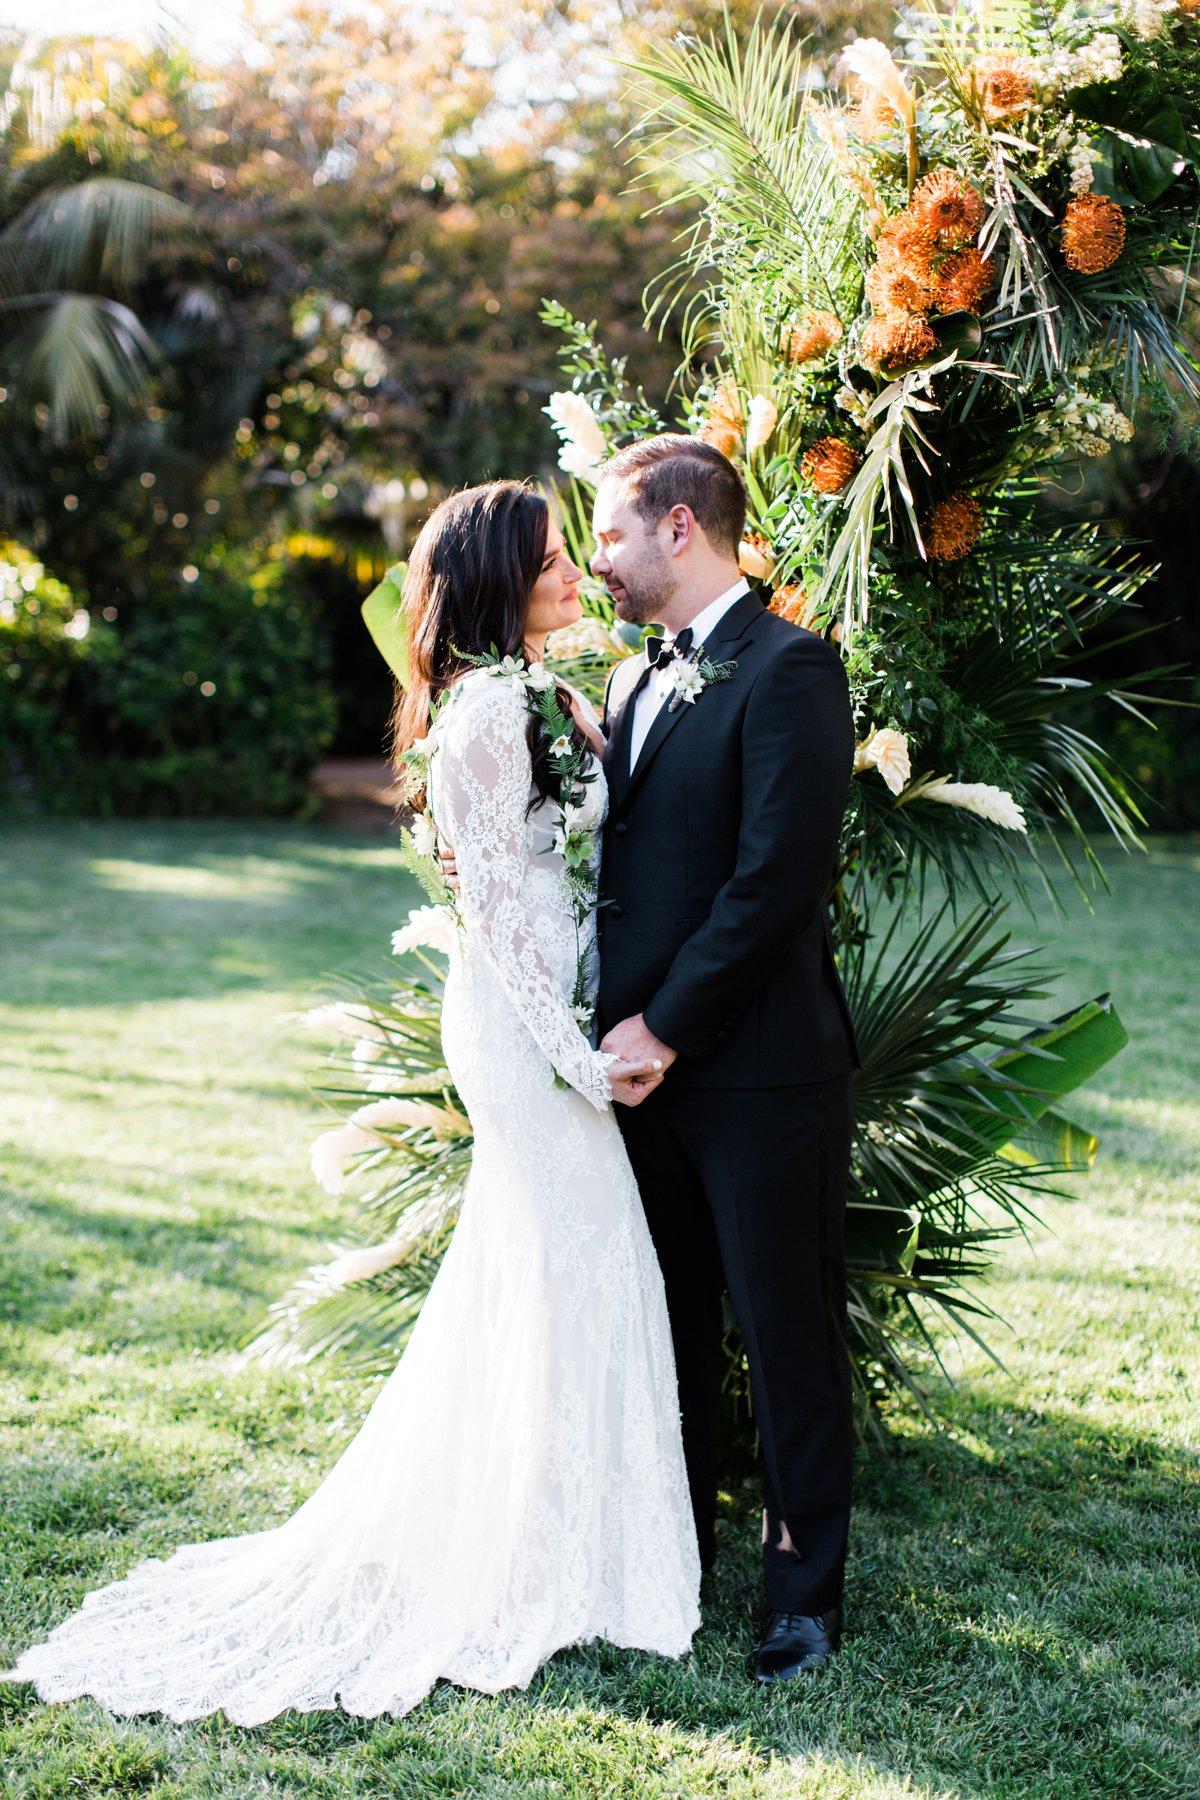 tropical wedding inspiration - photo by Anna Delores http://ruffledblog.com/chic-modern-wedding-at-four-seasons-santa-barbara